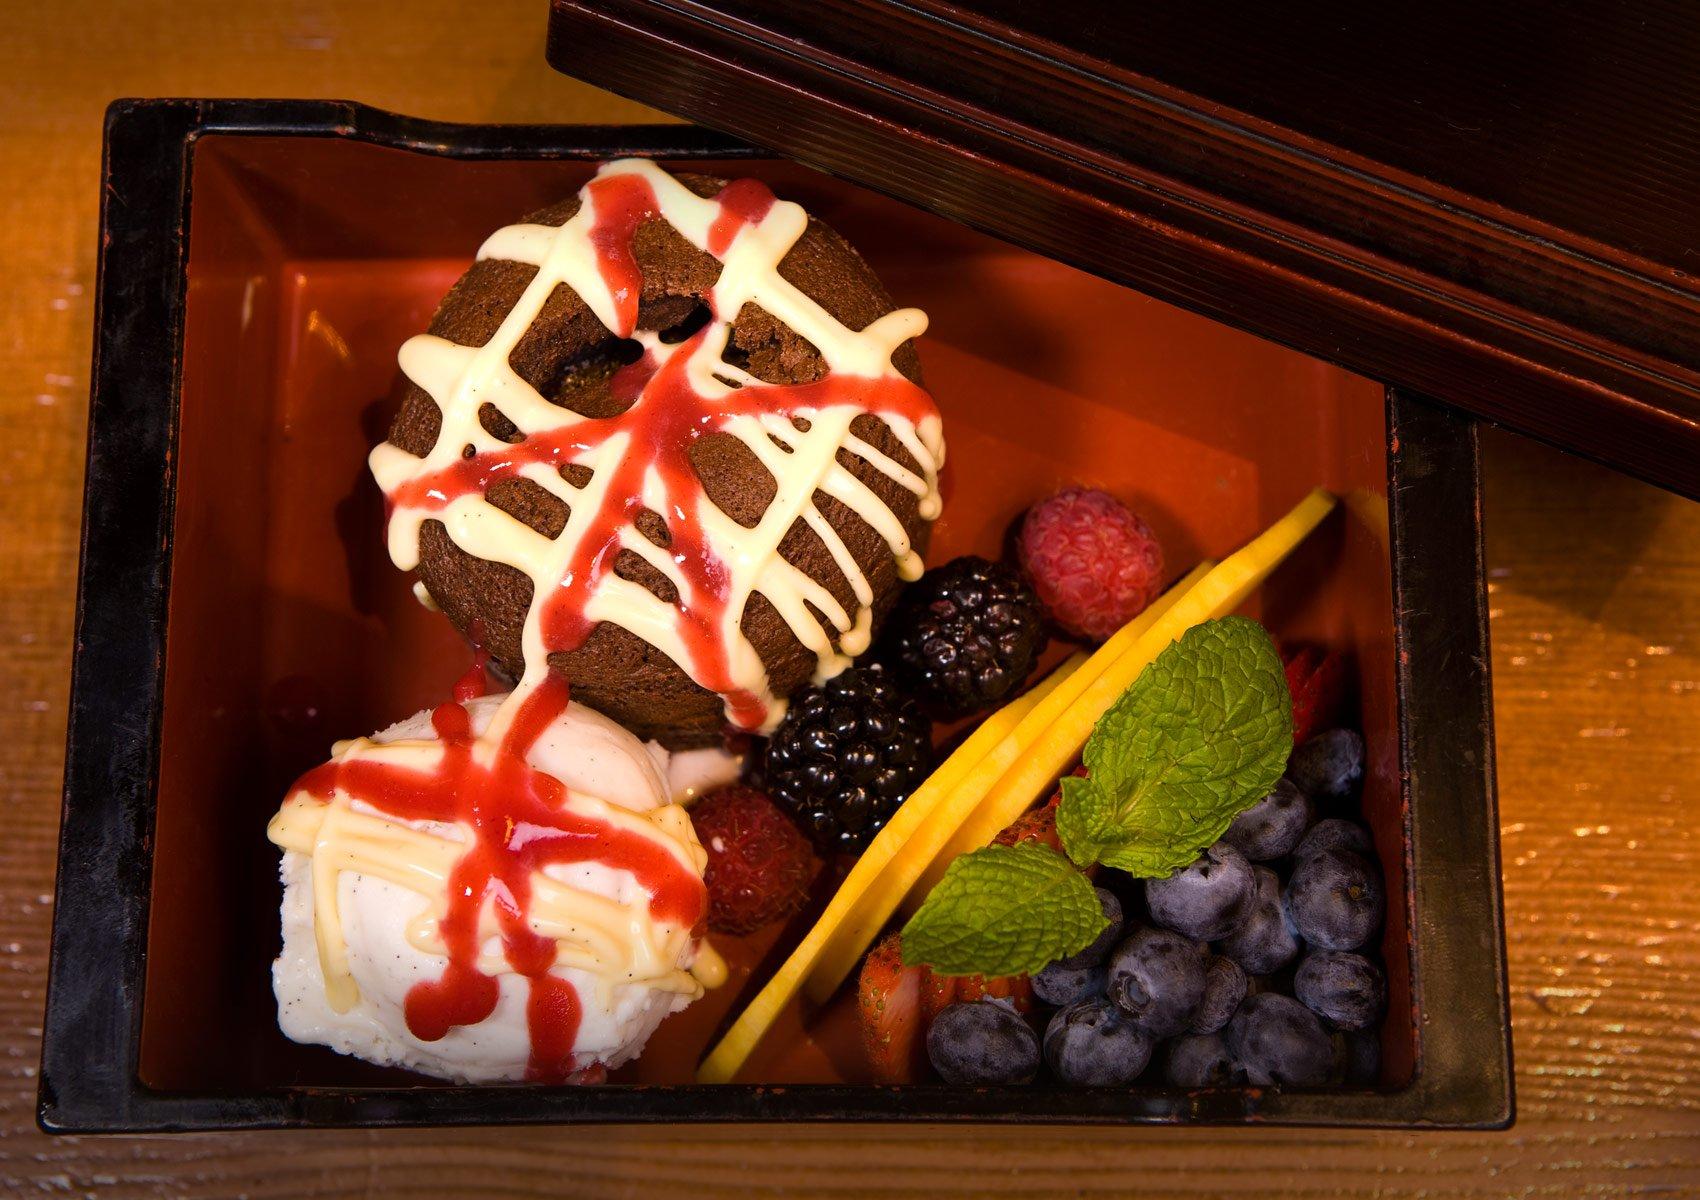 Delicious Desserts at Mastuhisa Sushi Vail CO